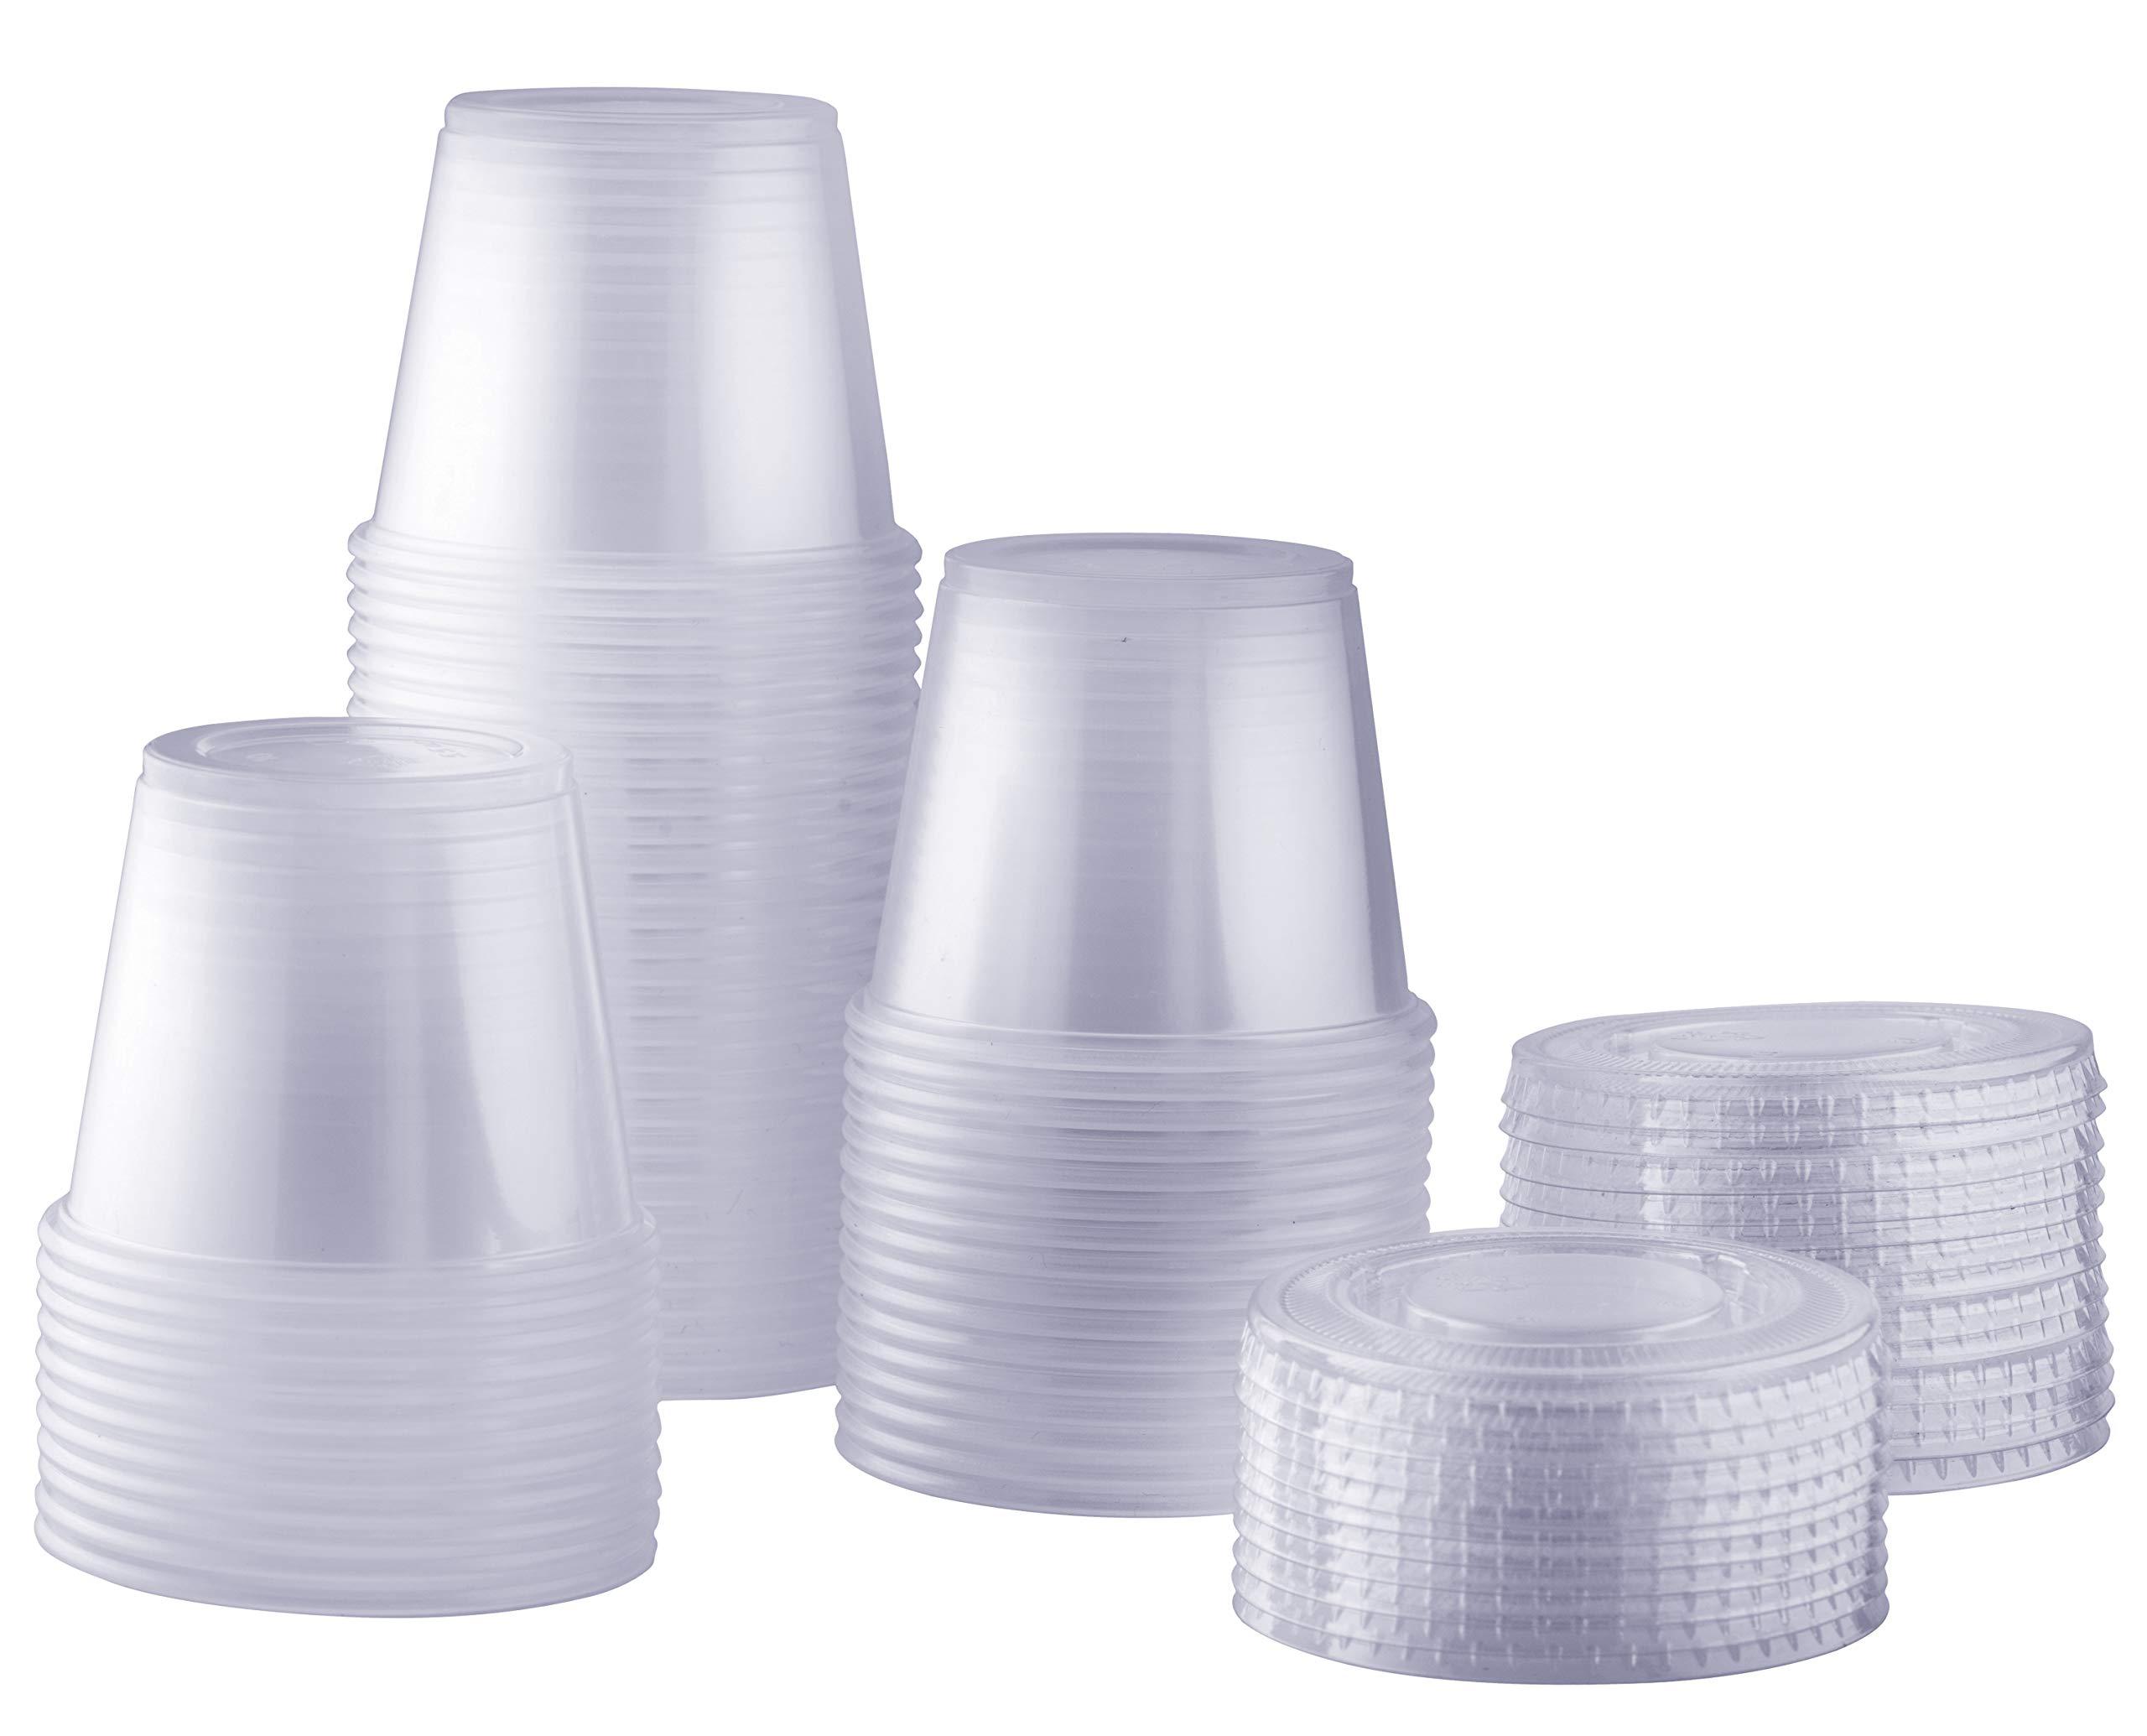 [100 Sets - 5.5 oz.] Plastic Disposable Portion Cups With Lids, Souffle Cups, Condiment Cups